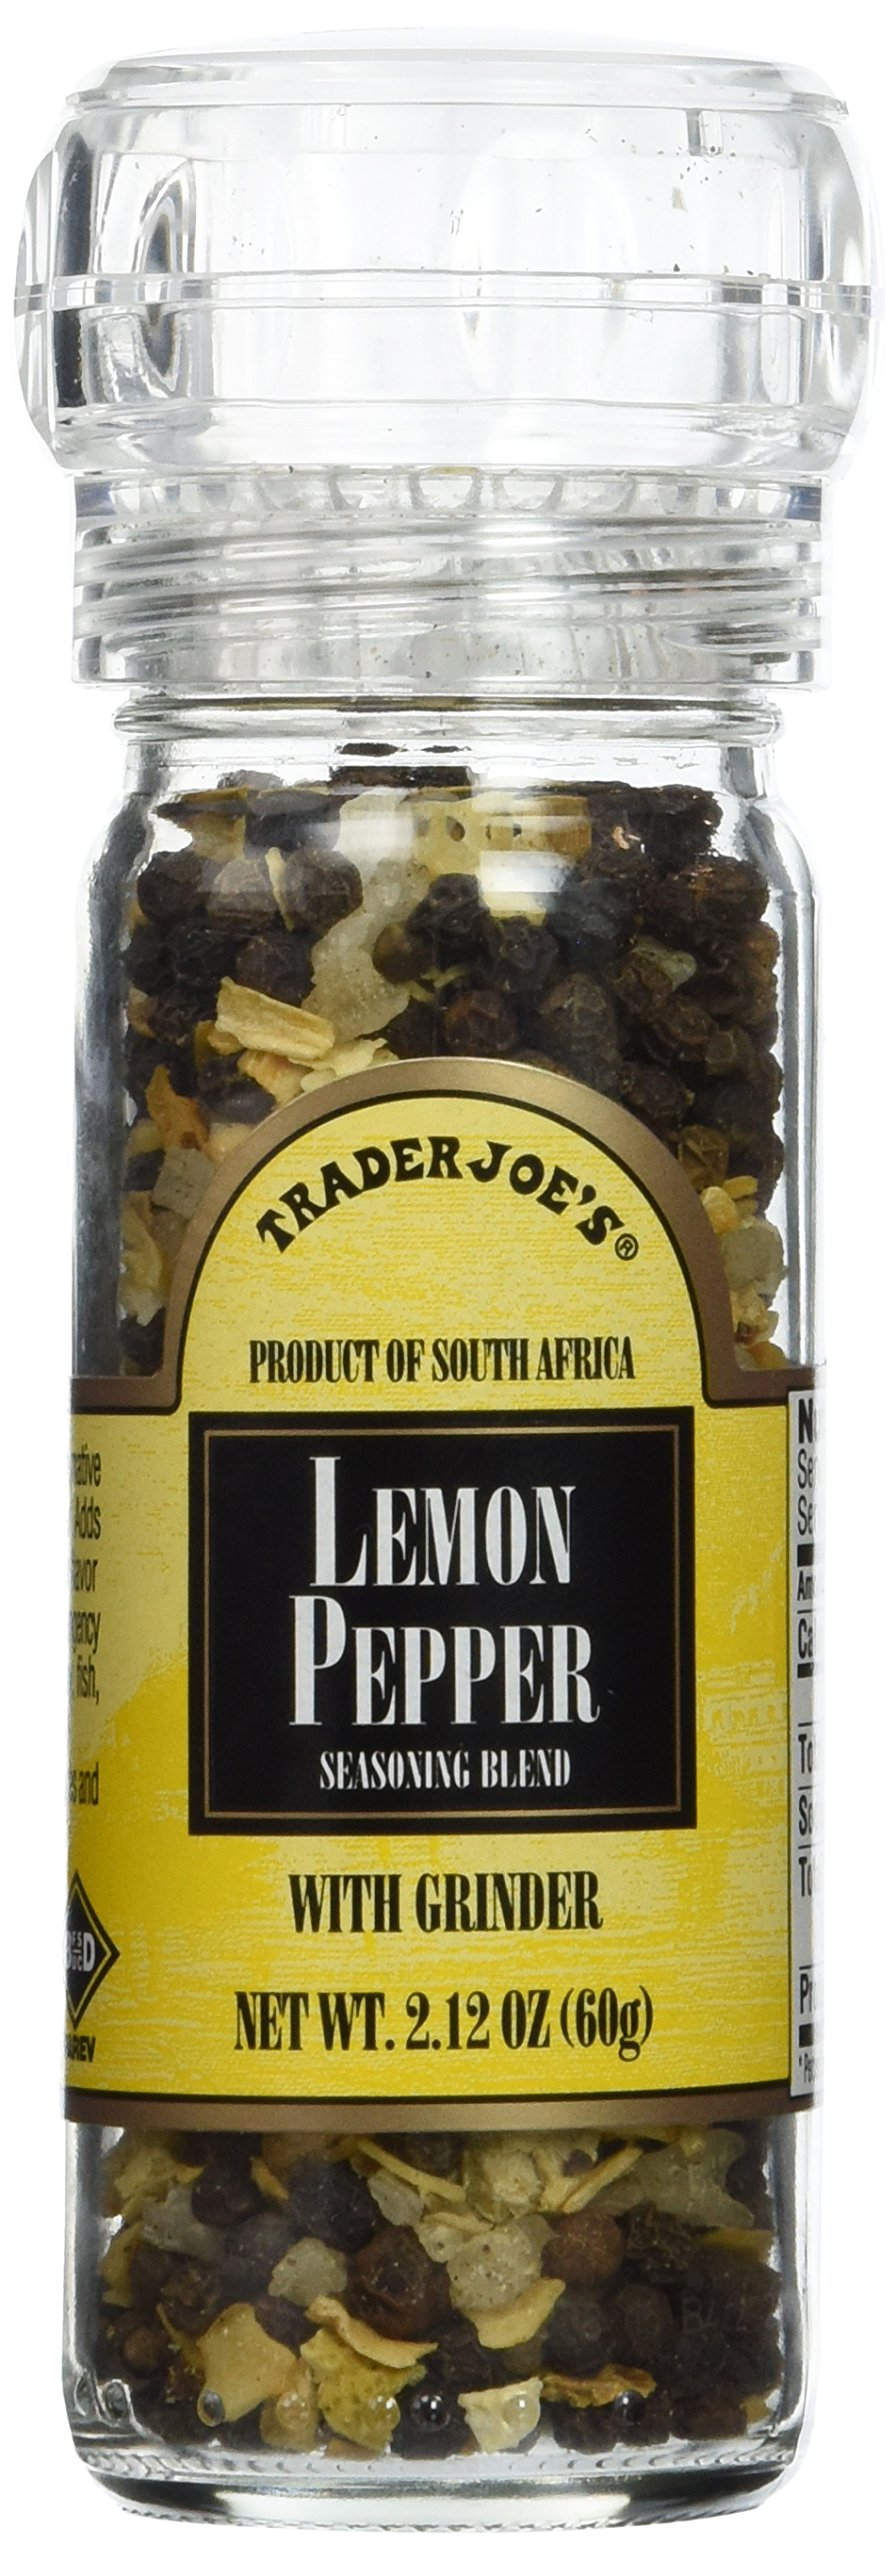 Trader Joe's Lemon Pepper Peppercorns with Grinder -- 2-Pack